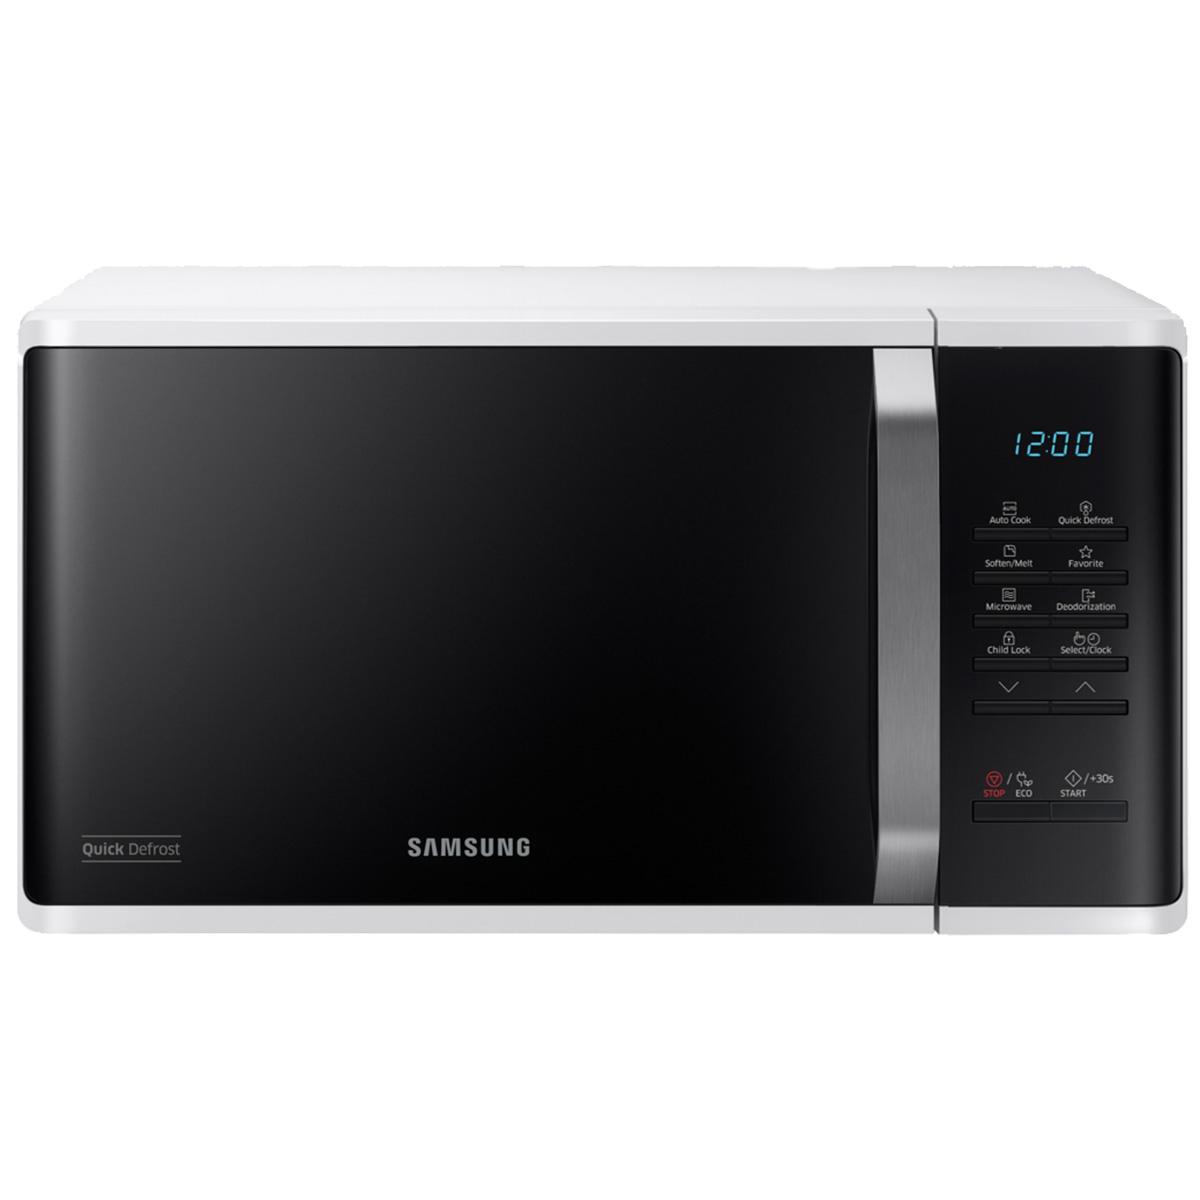 Samsung mikrobølgeovn - MS23K3523AW/EE